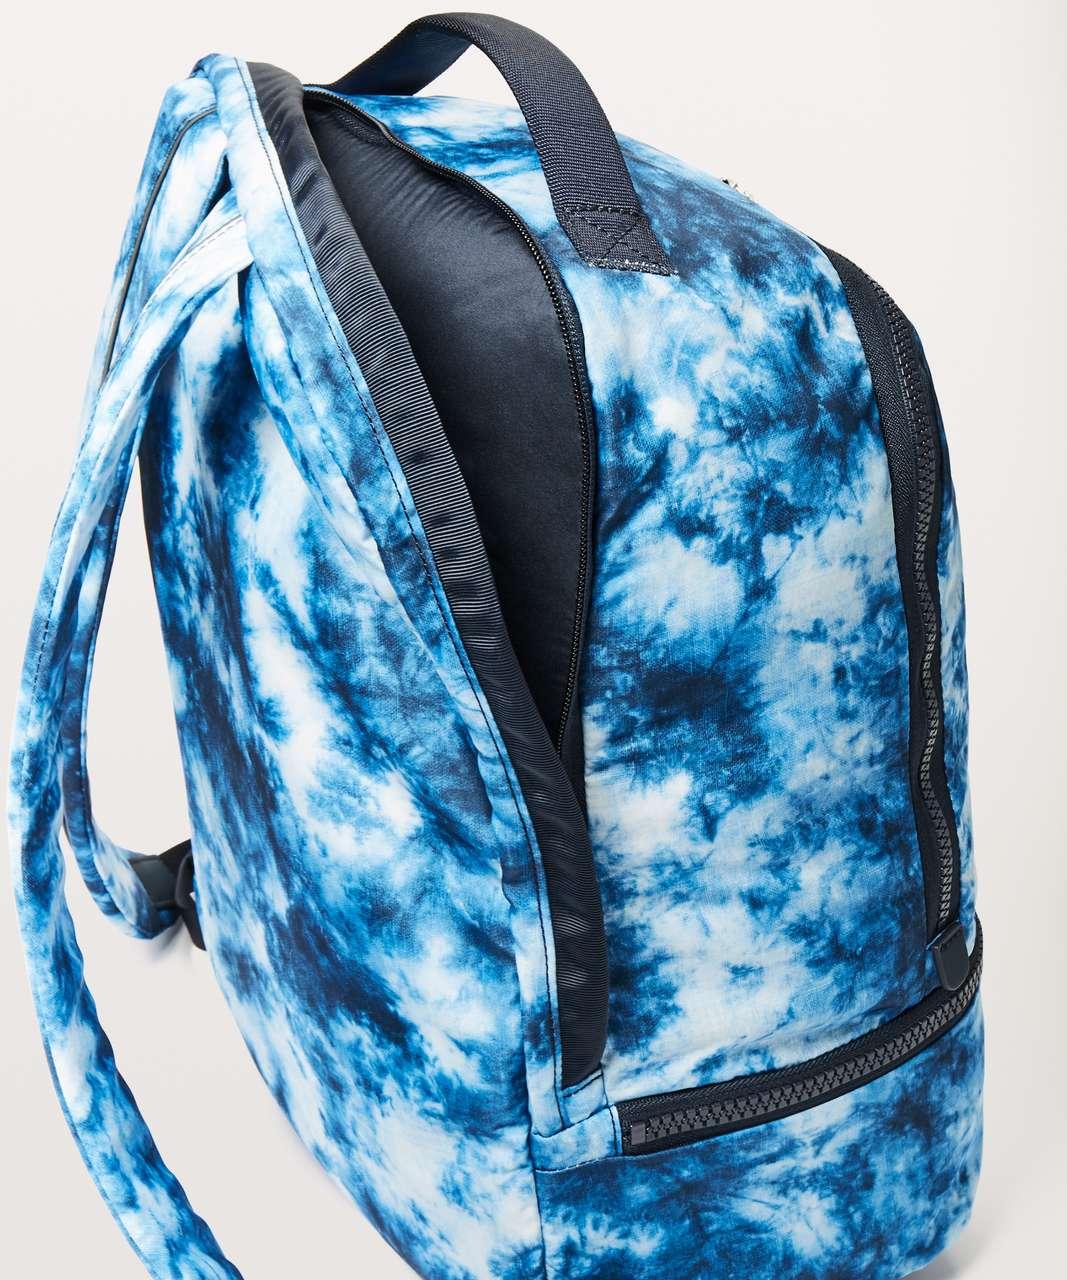 Lululemon City Adventurer Backpack *17L - Tie Dye Blue / True Navy